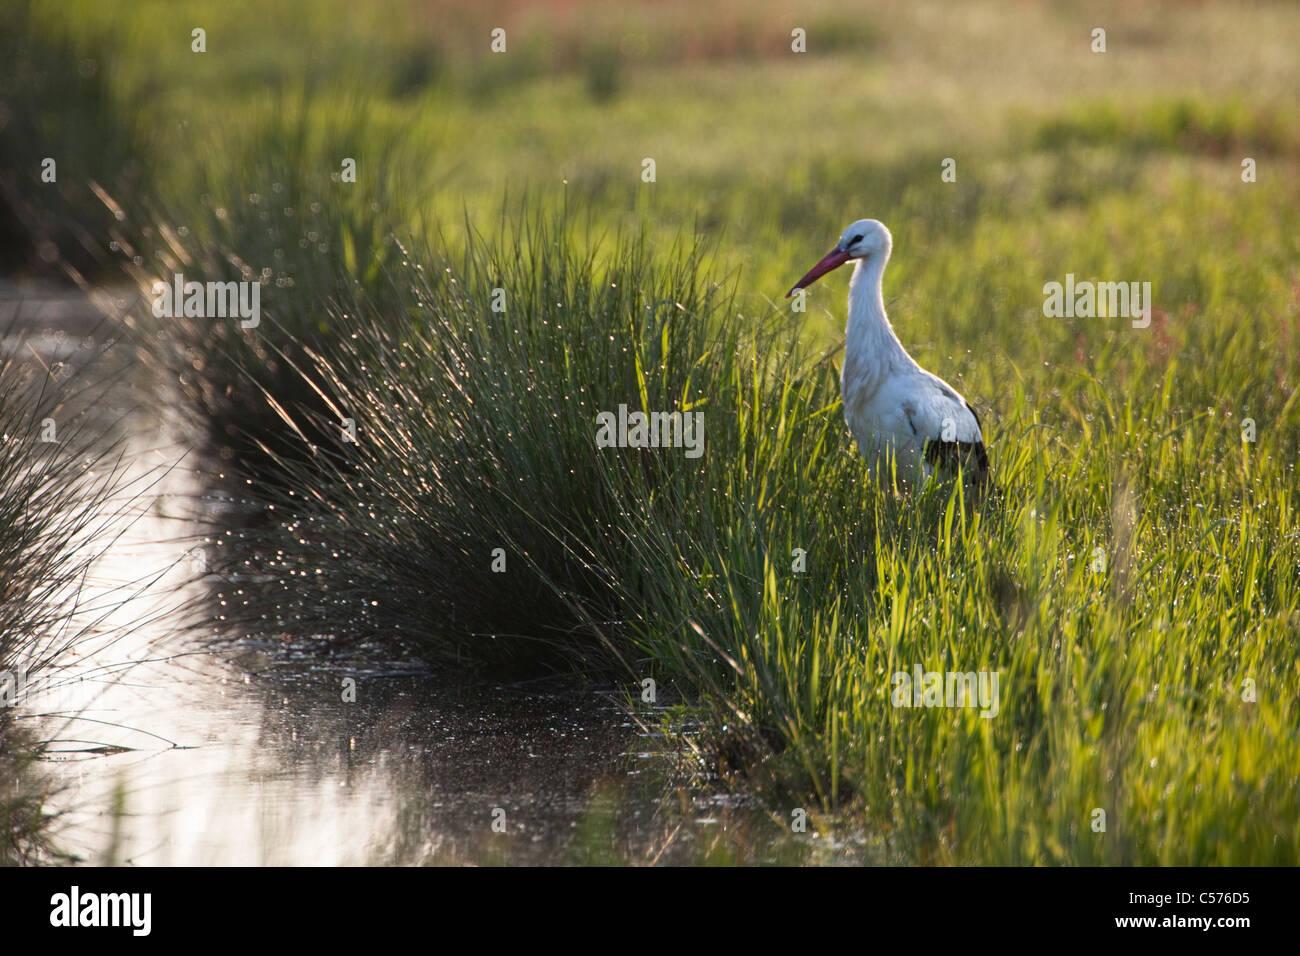 Der Niederlande, Jonen, Storch am Creek. Stockbild